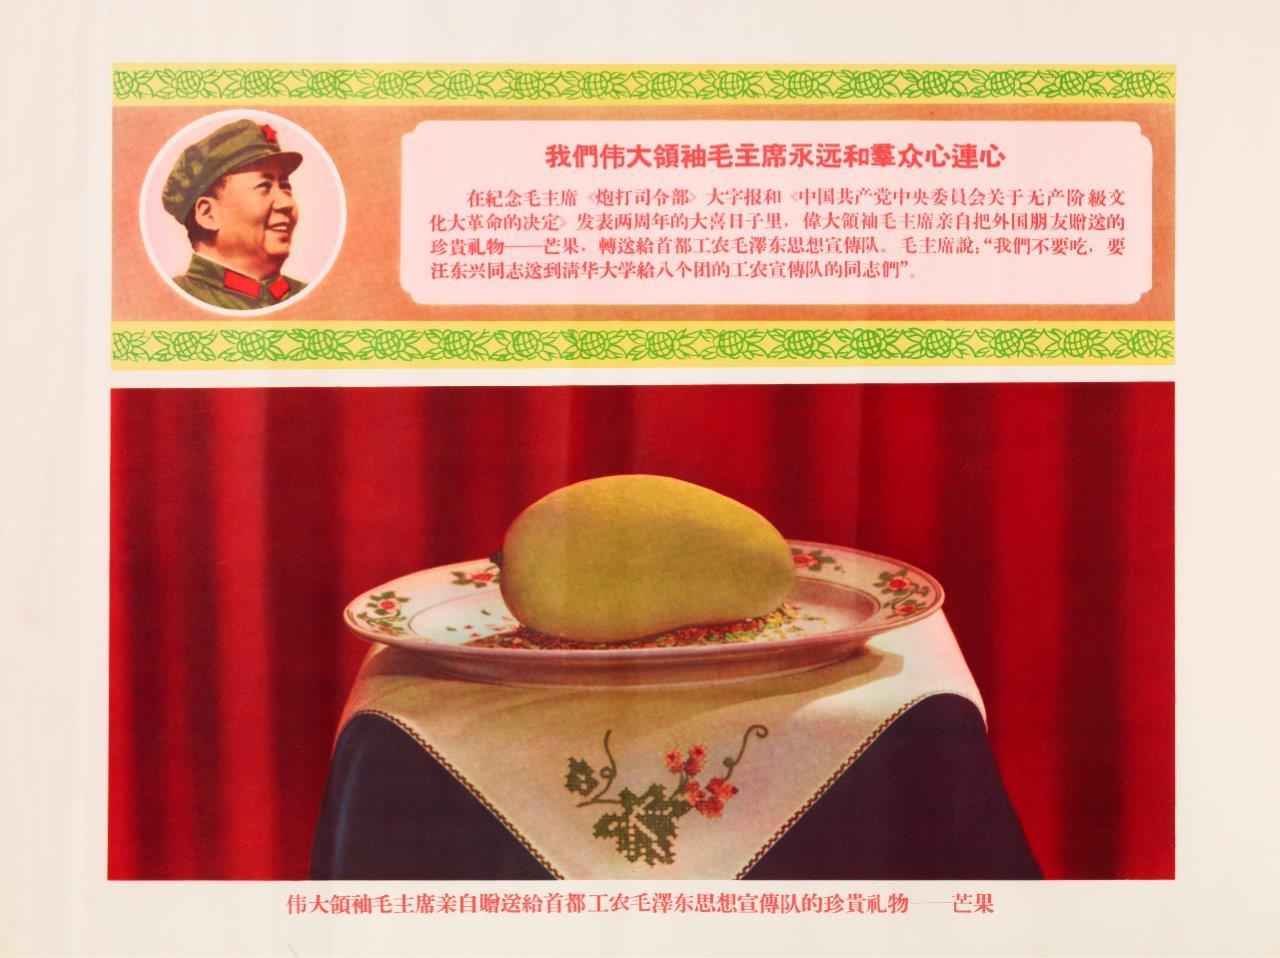 mango-on-a-plate-2